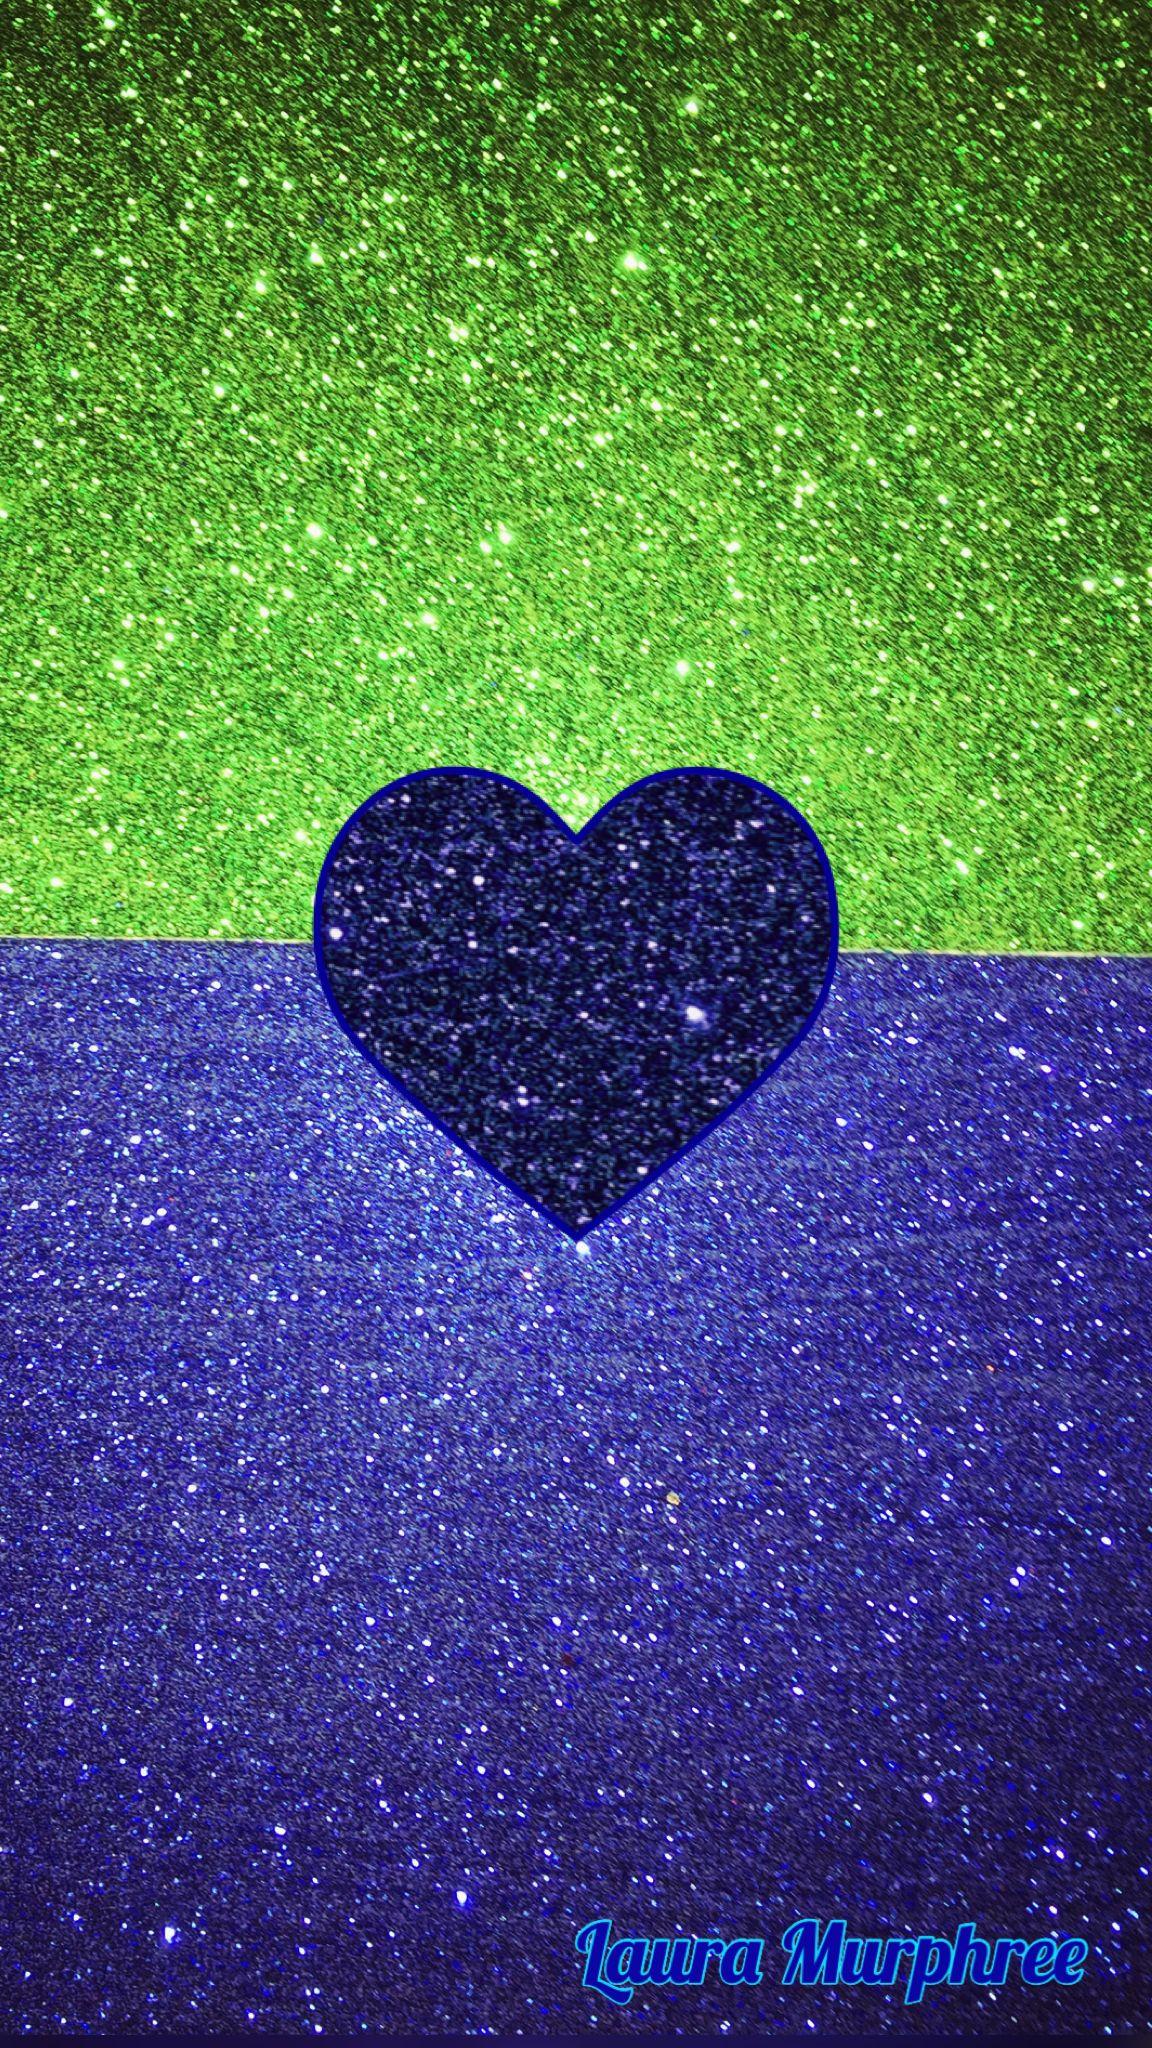 Glitter Phone Wallpaper Green Blue Sparkle Background Glitter Heart Girly Pretty Heart Iphone Wallpaper Blue Glitter Wallpaper Glitter Wallpaper